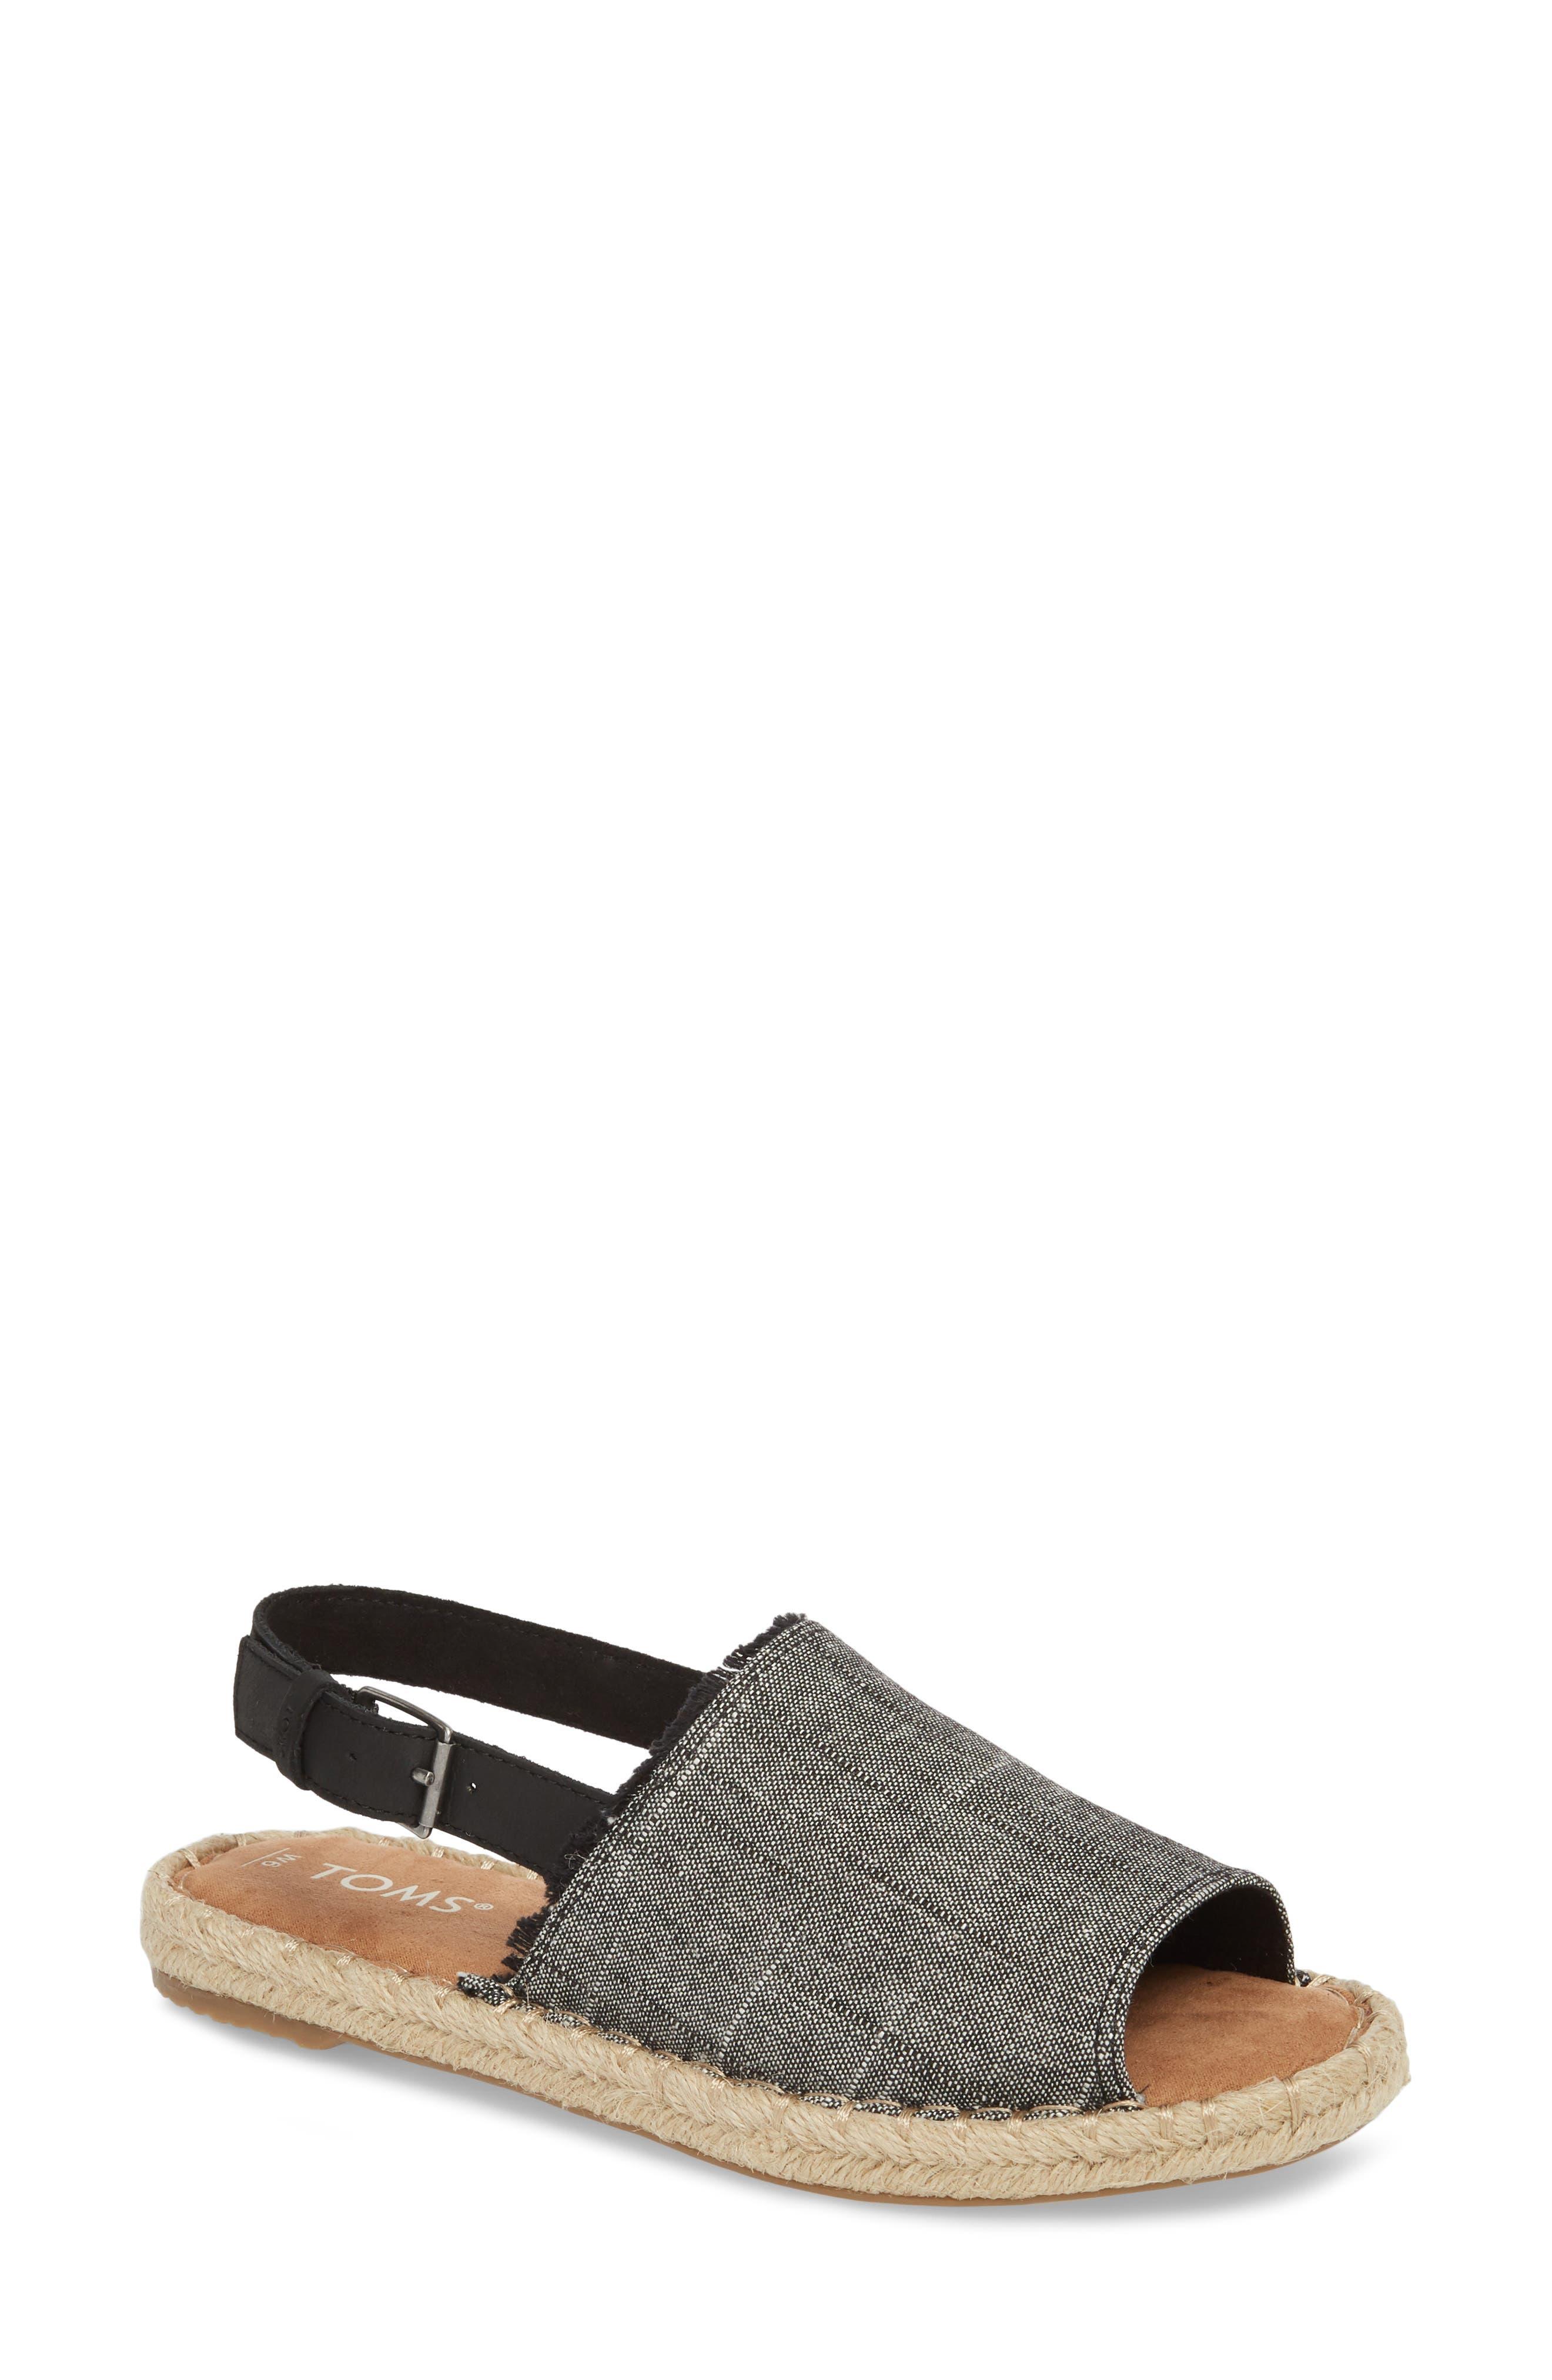 Clara Slingback Sandal,                         Main,                         color, 002